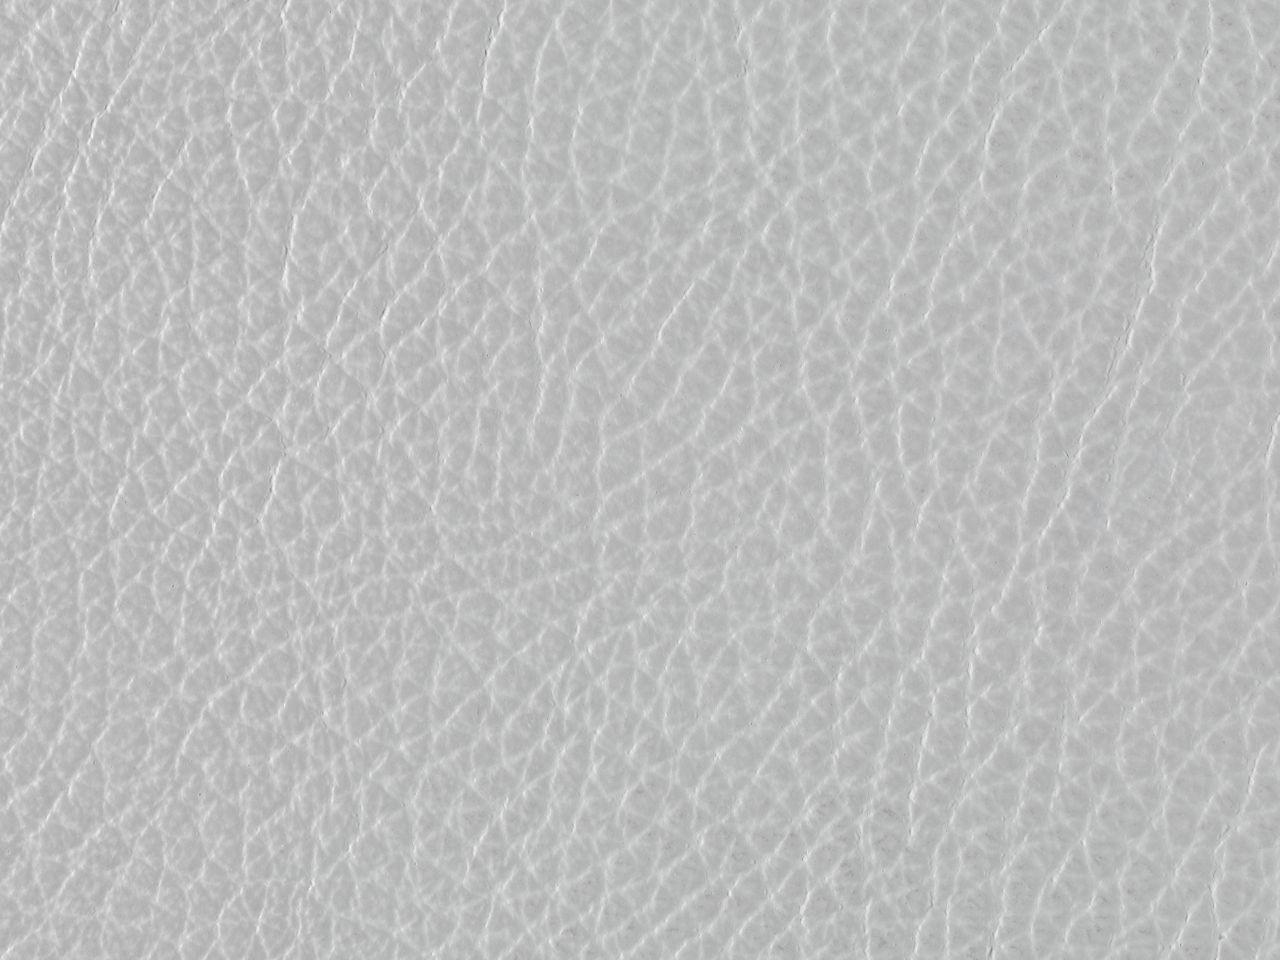 Texture Pelle Divano.Texture Pelle Bianco Rivestimenti In Pelle Nel 2019